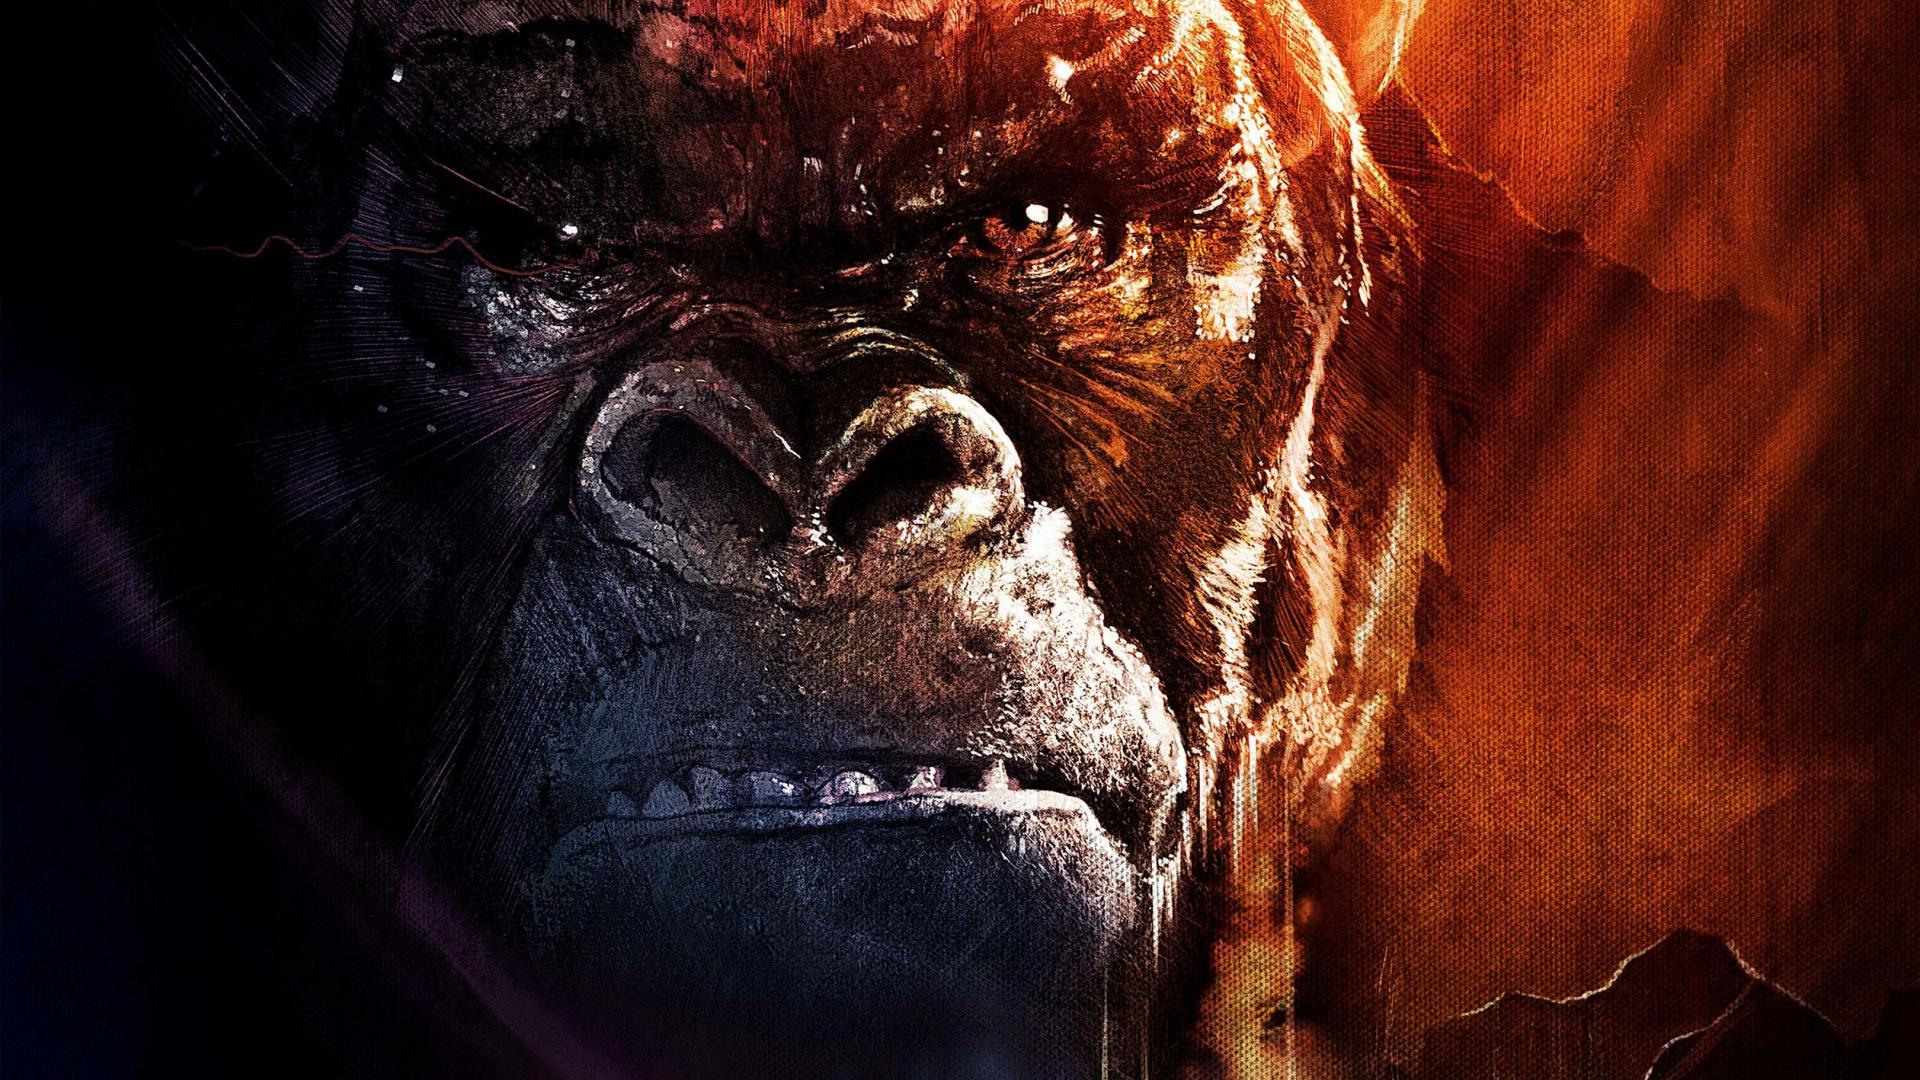 Download 1920x1080 Wallpaper 2017 Movie Kong Skull Island